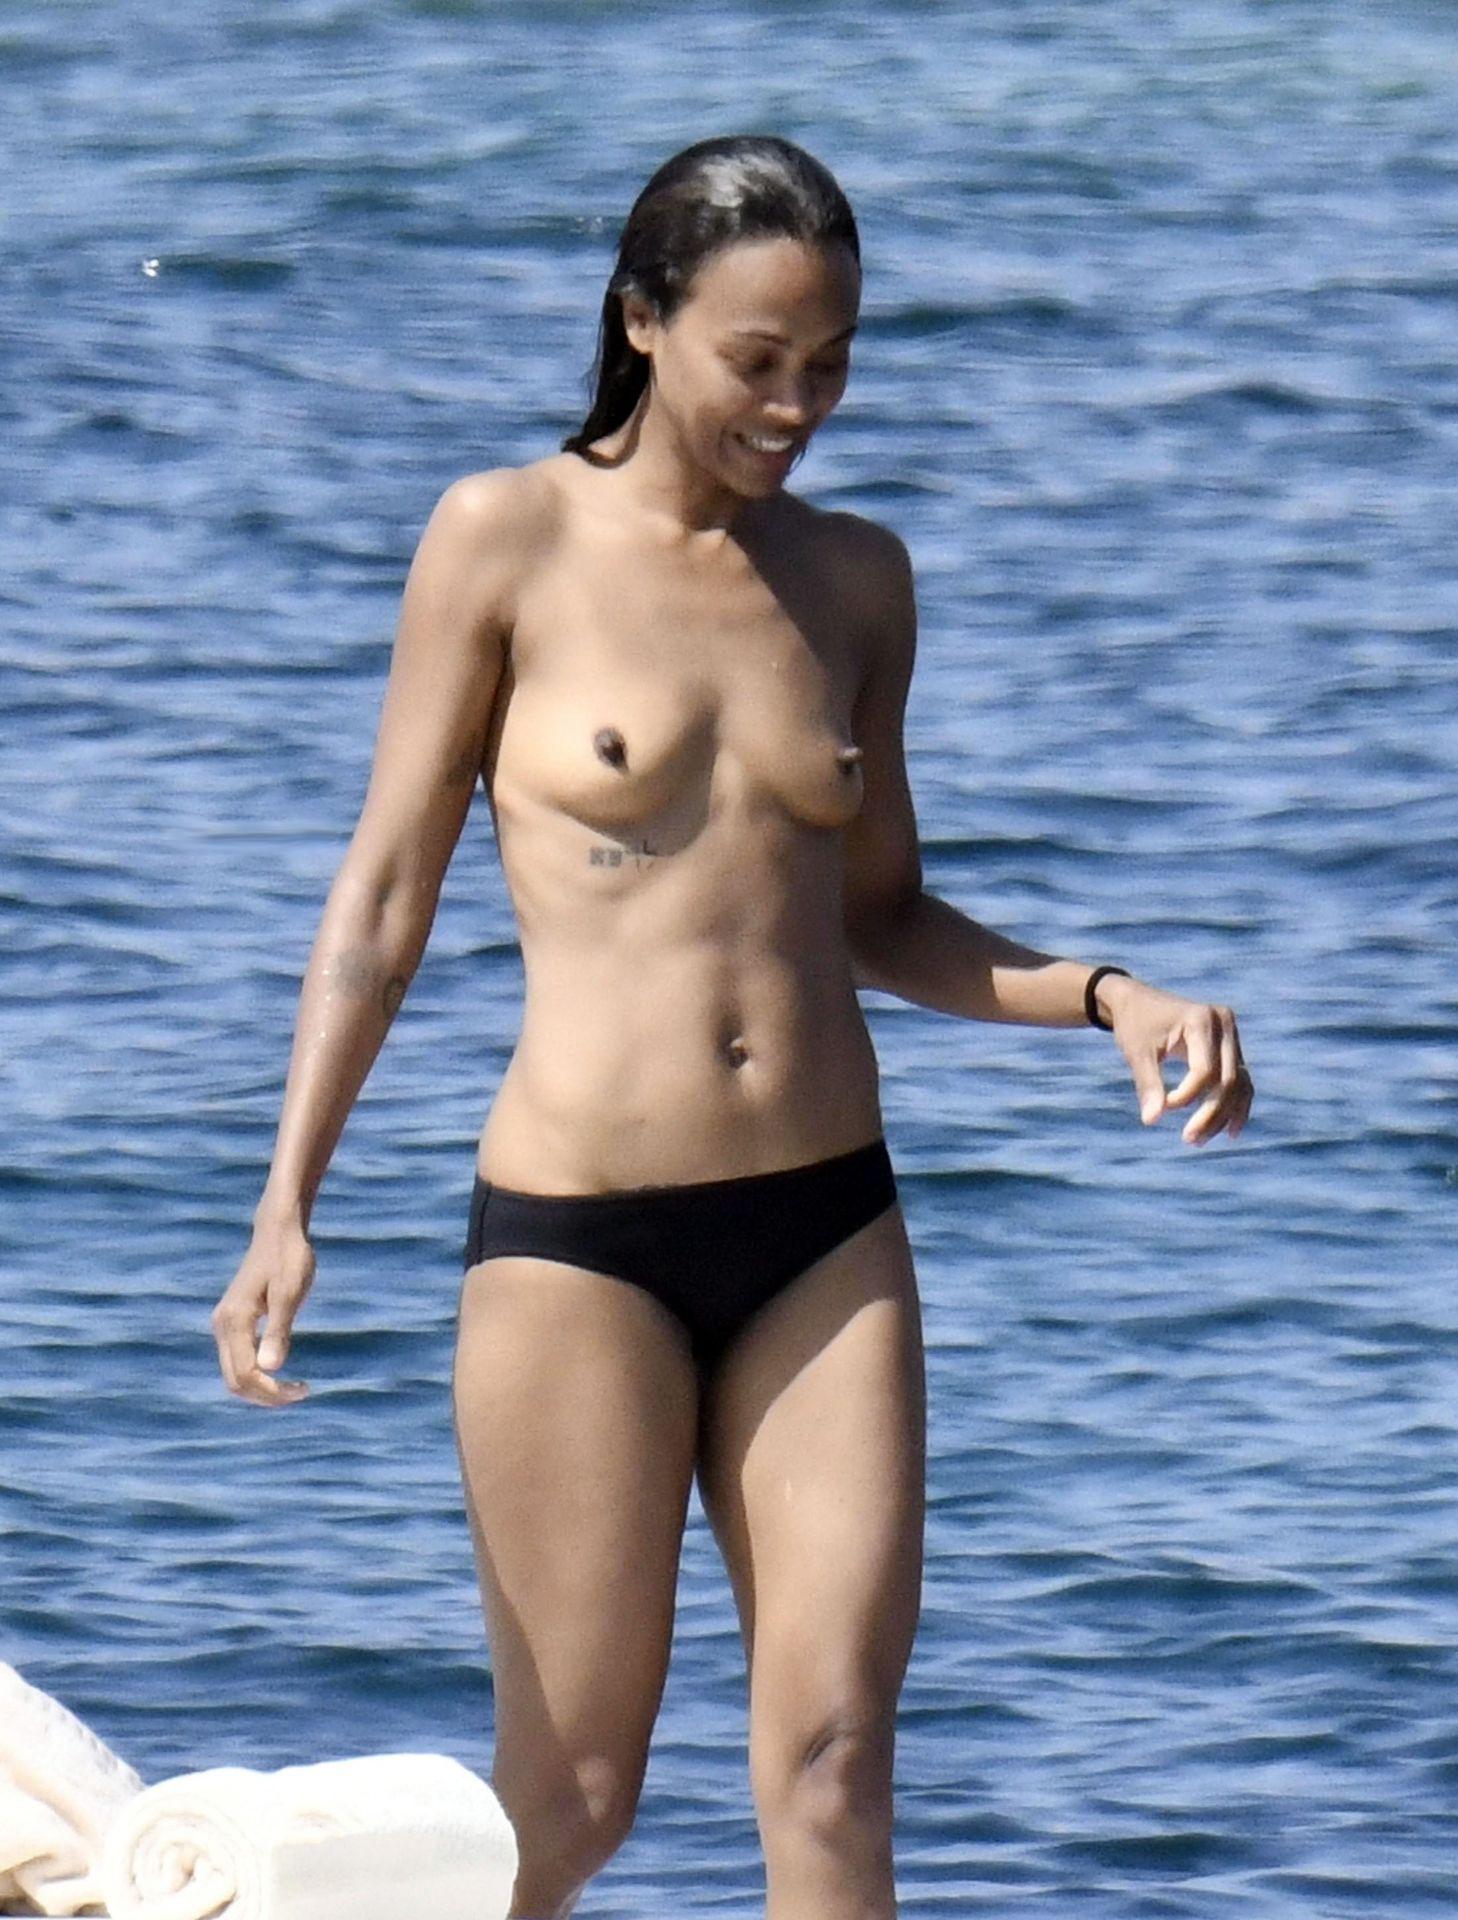 Zoe Saldana Caught By Paparazzi Topless